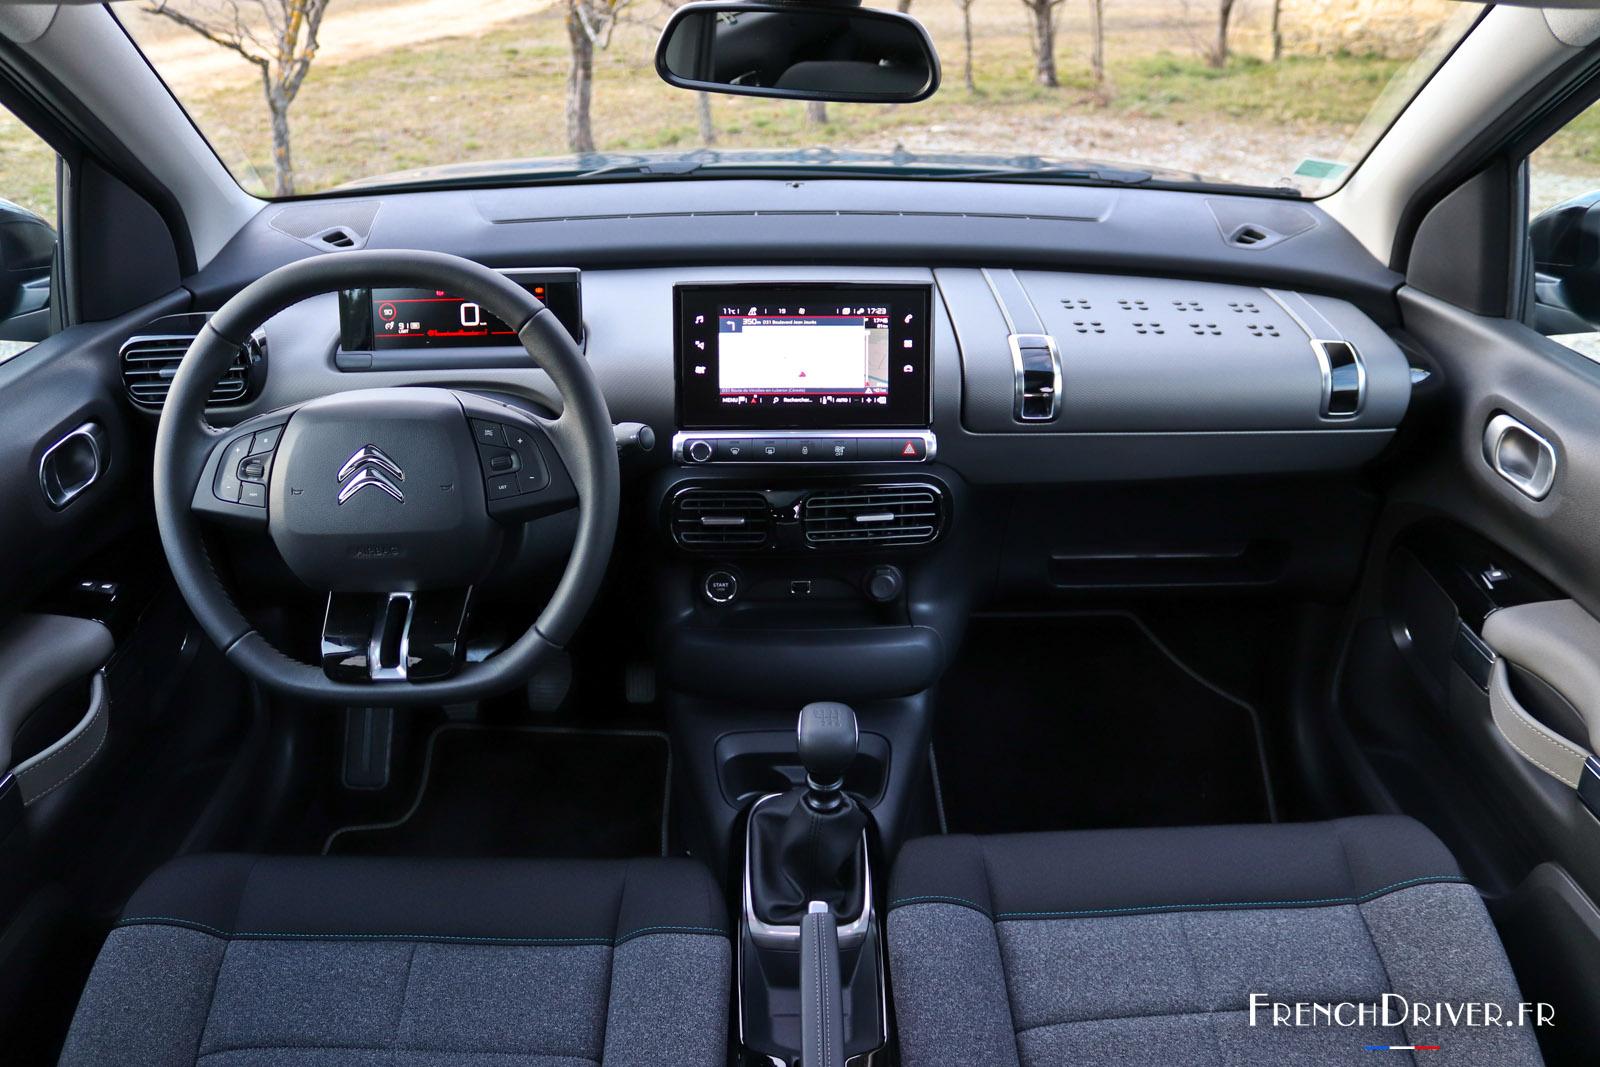 Essai Citroen C4 Cactus Restylee A Contre Courant French Driver